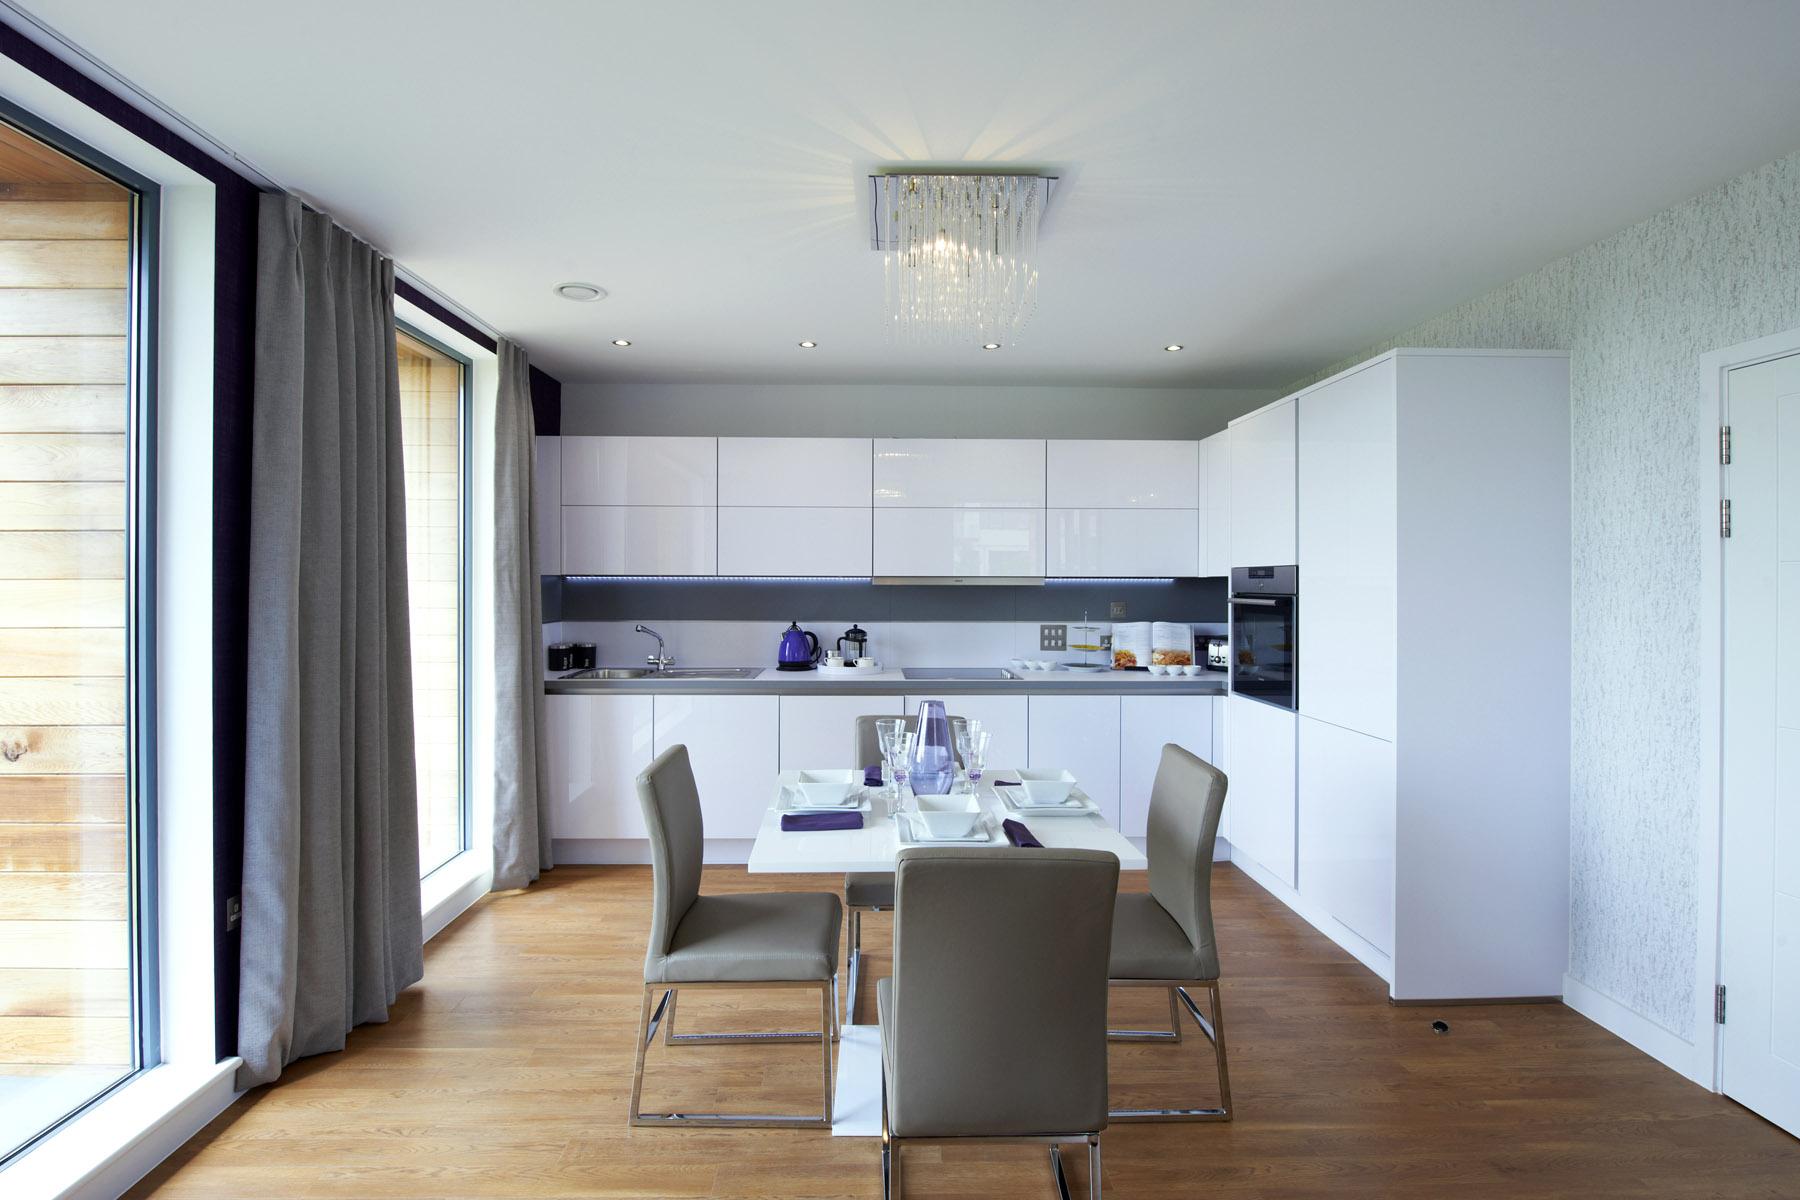 Living Room Interior Design Inspiration look to the catwalk for interior design inspiration taylor wimpey inspiration